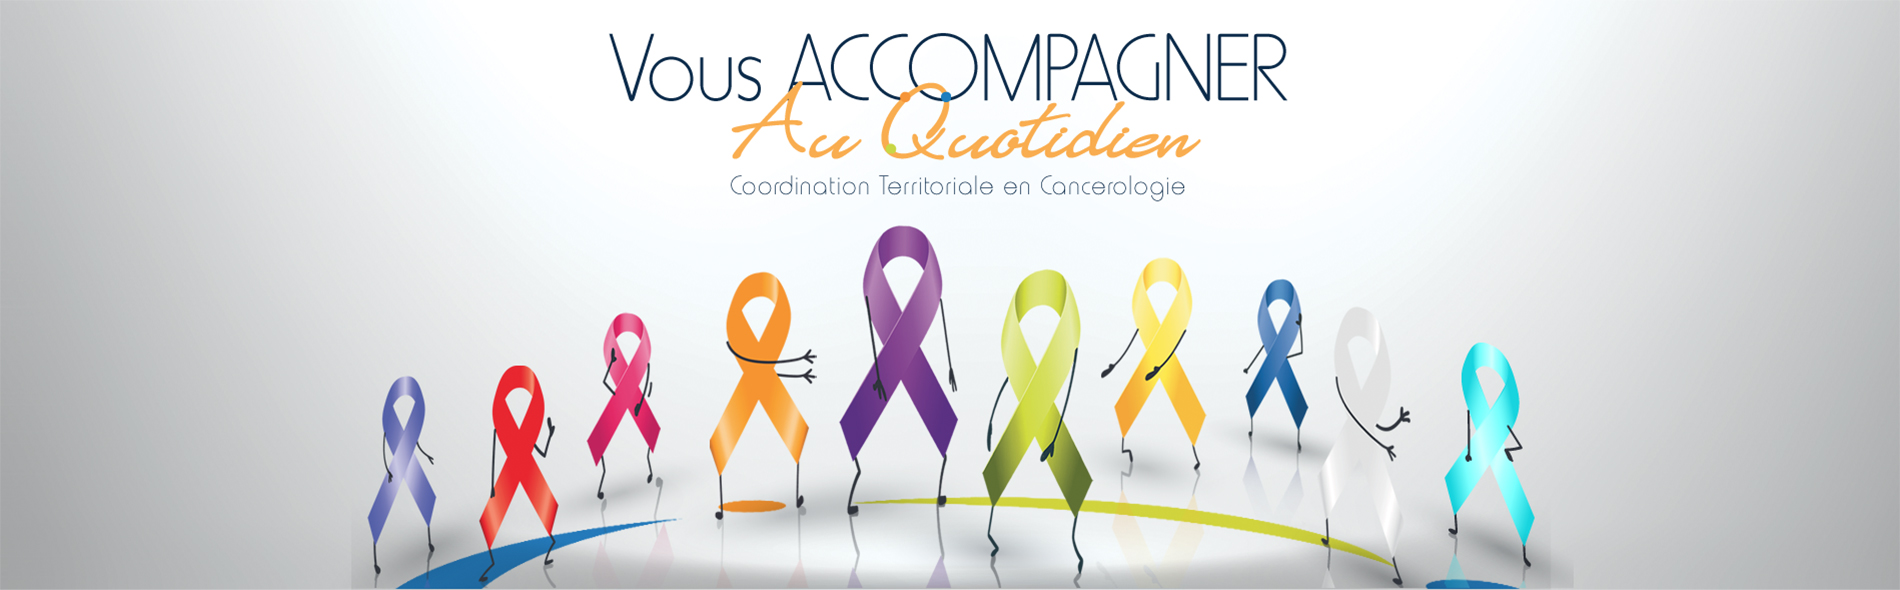 Association Coordination Territoriale Cancérologie bandeau image